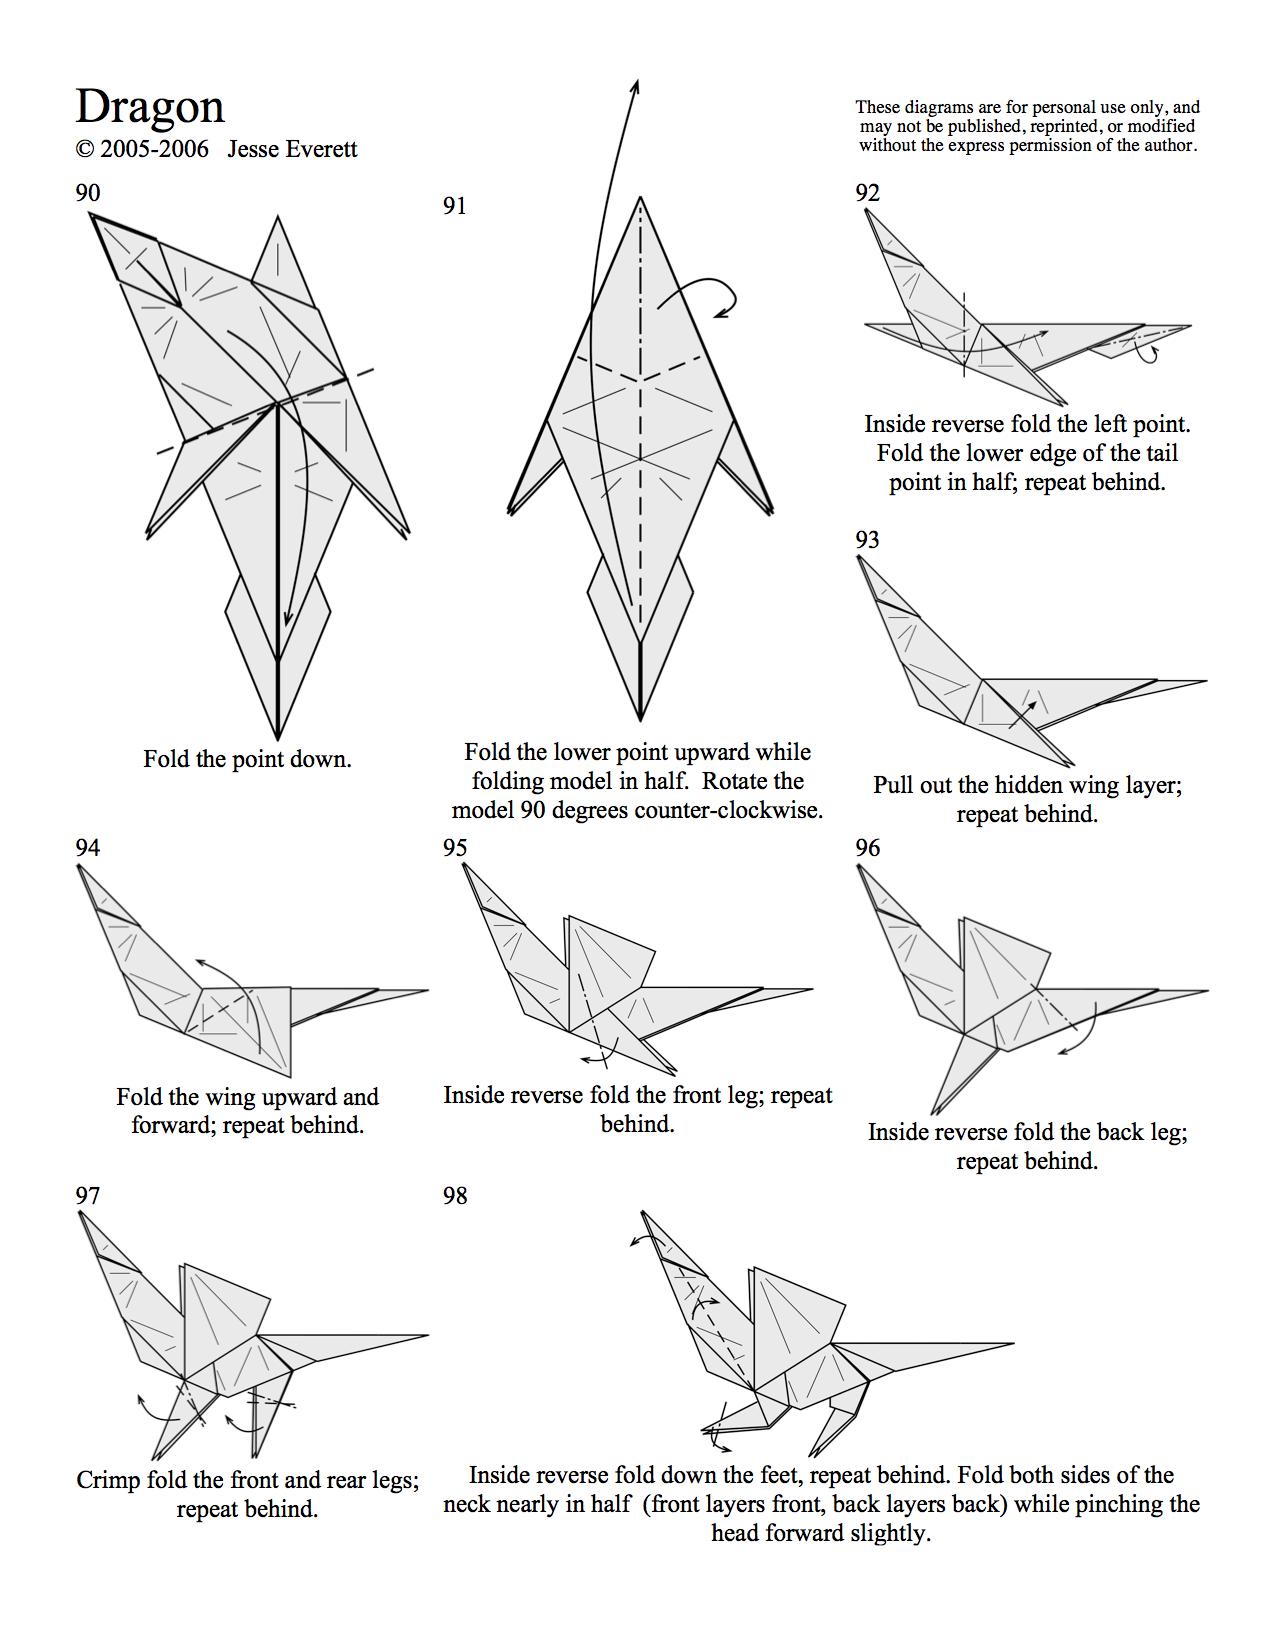 origami dragon in progress rh inprogressgaming com origami dragon diagrams complex origami dragon diagrams